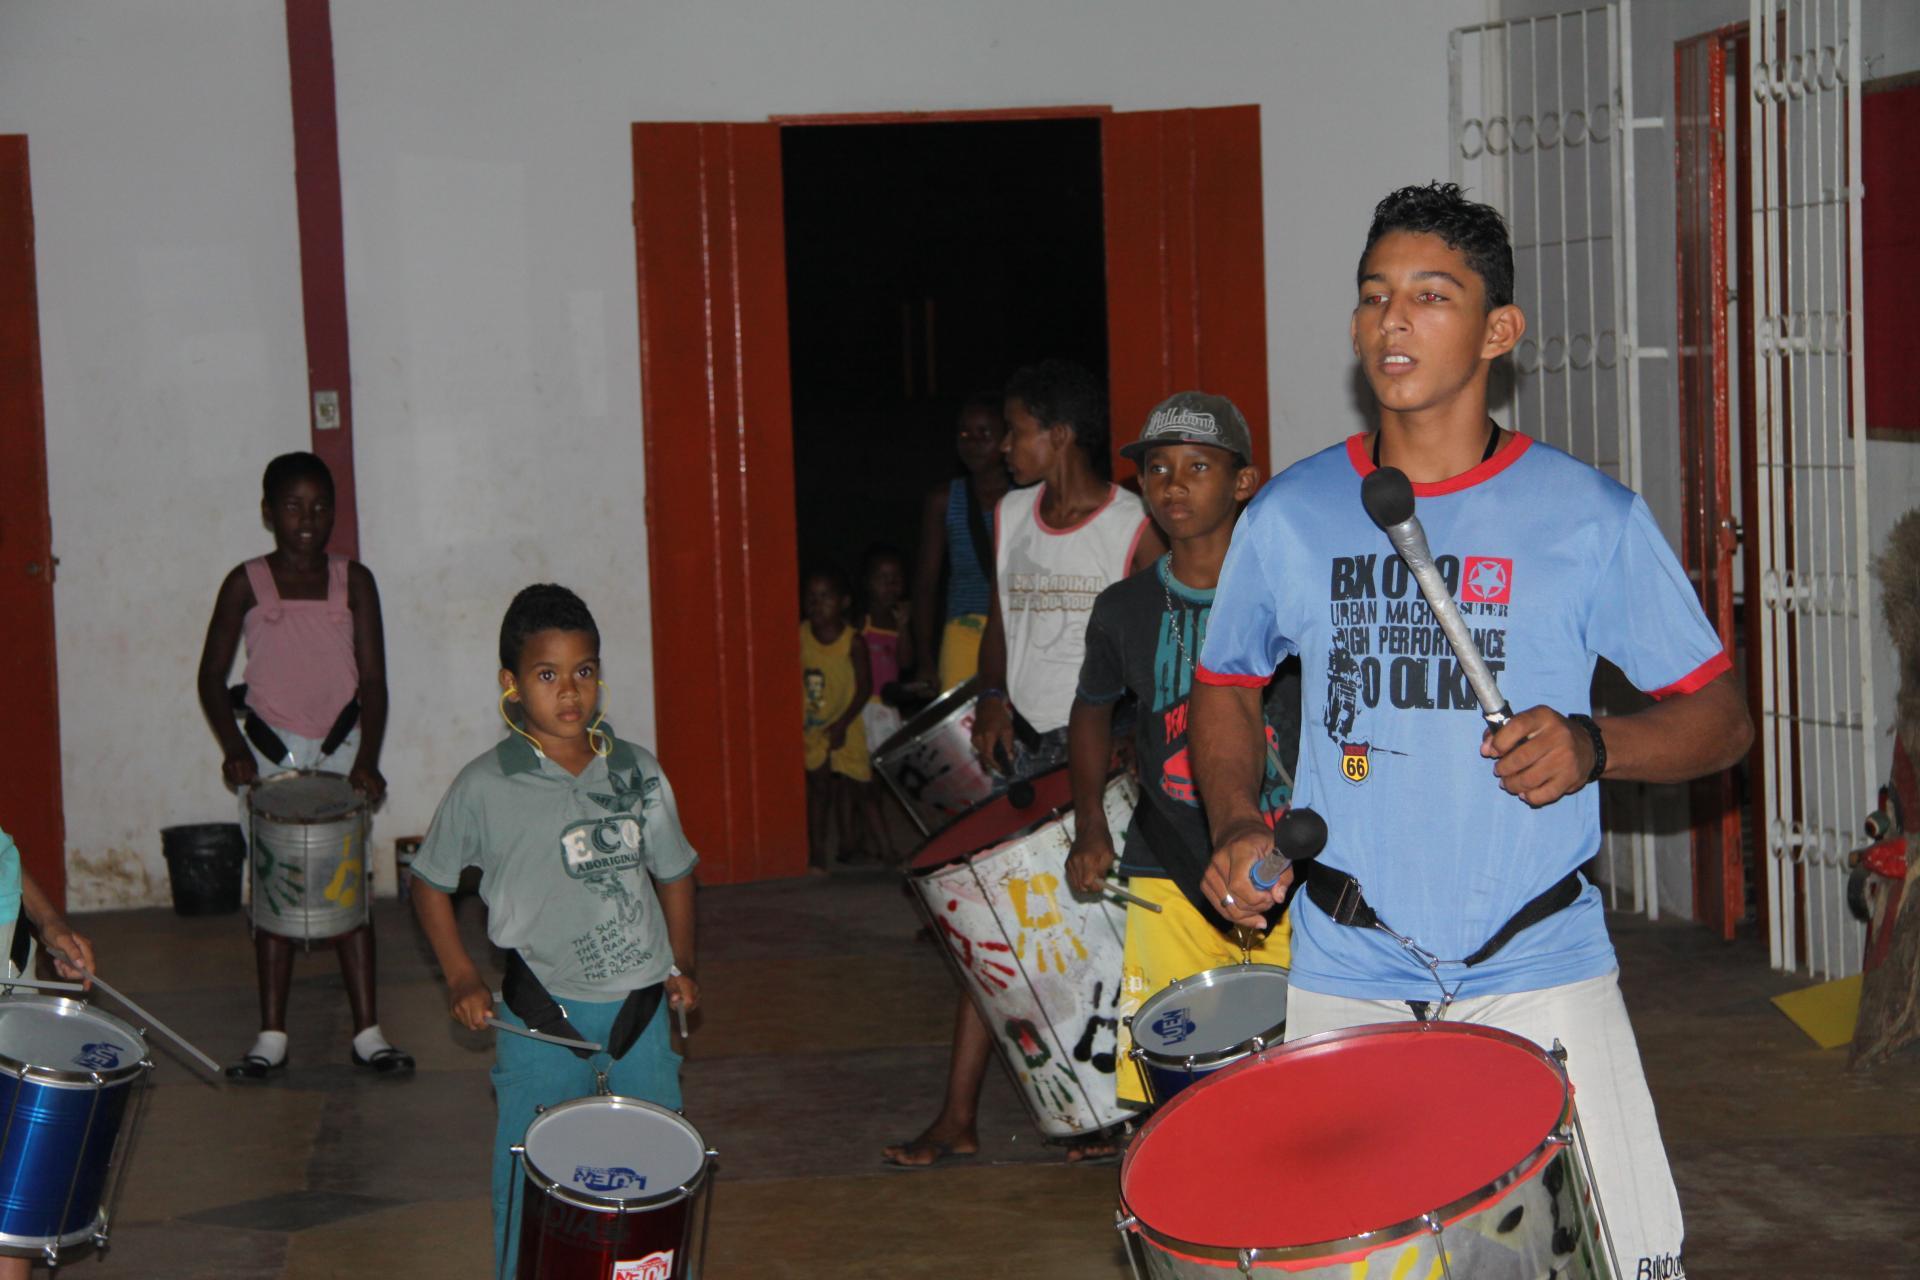 Trommelgruppe in Bahia